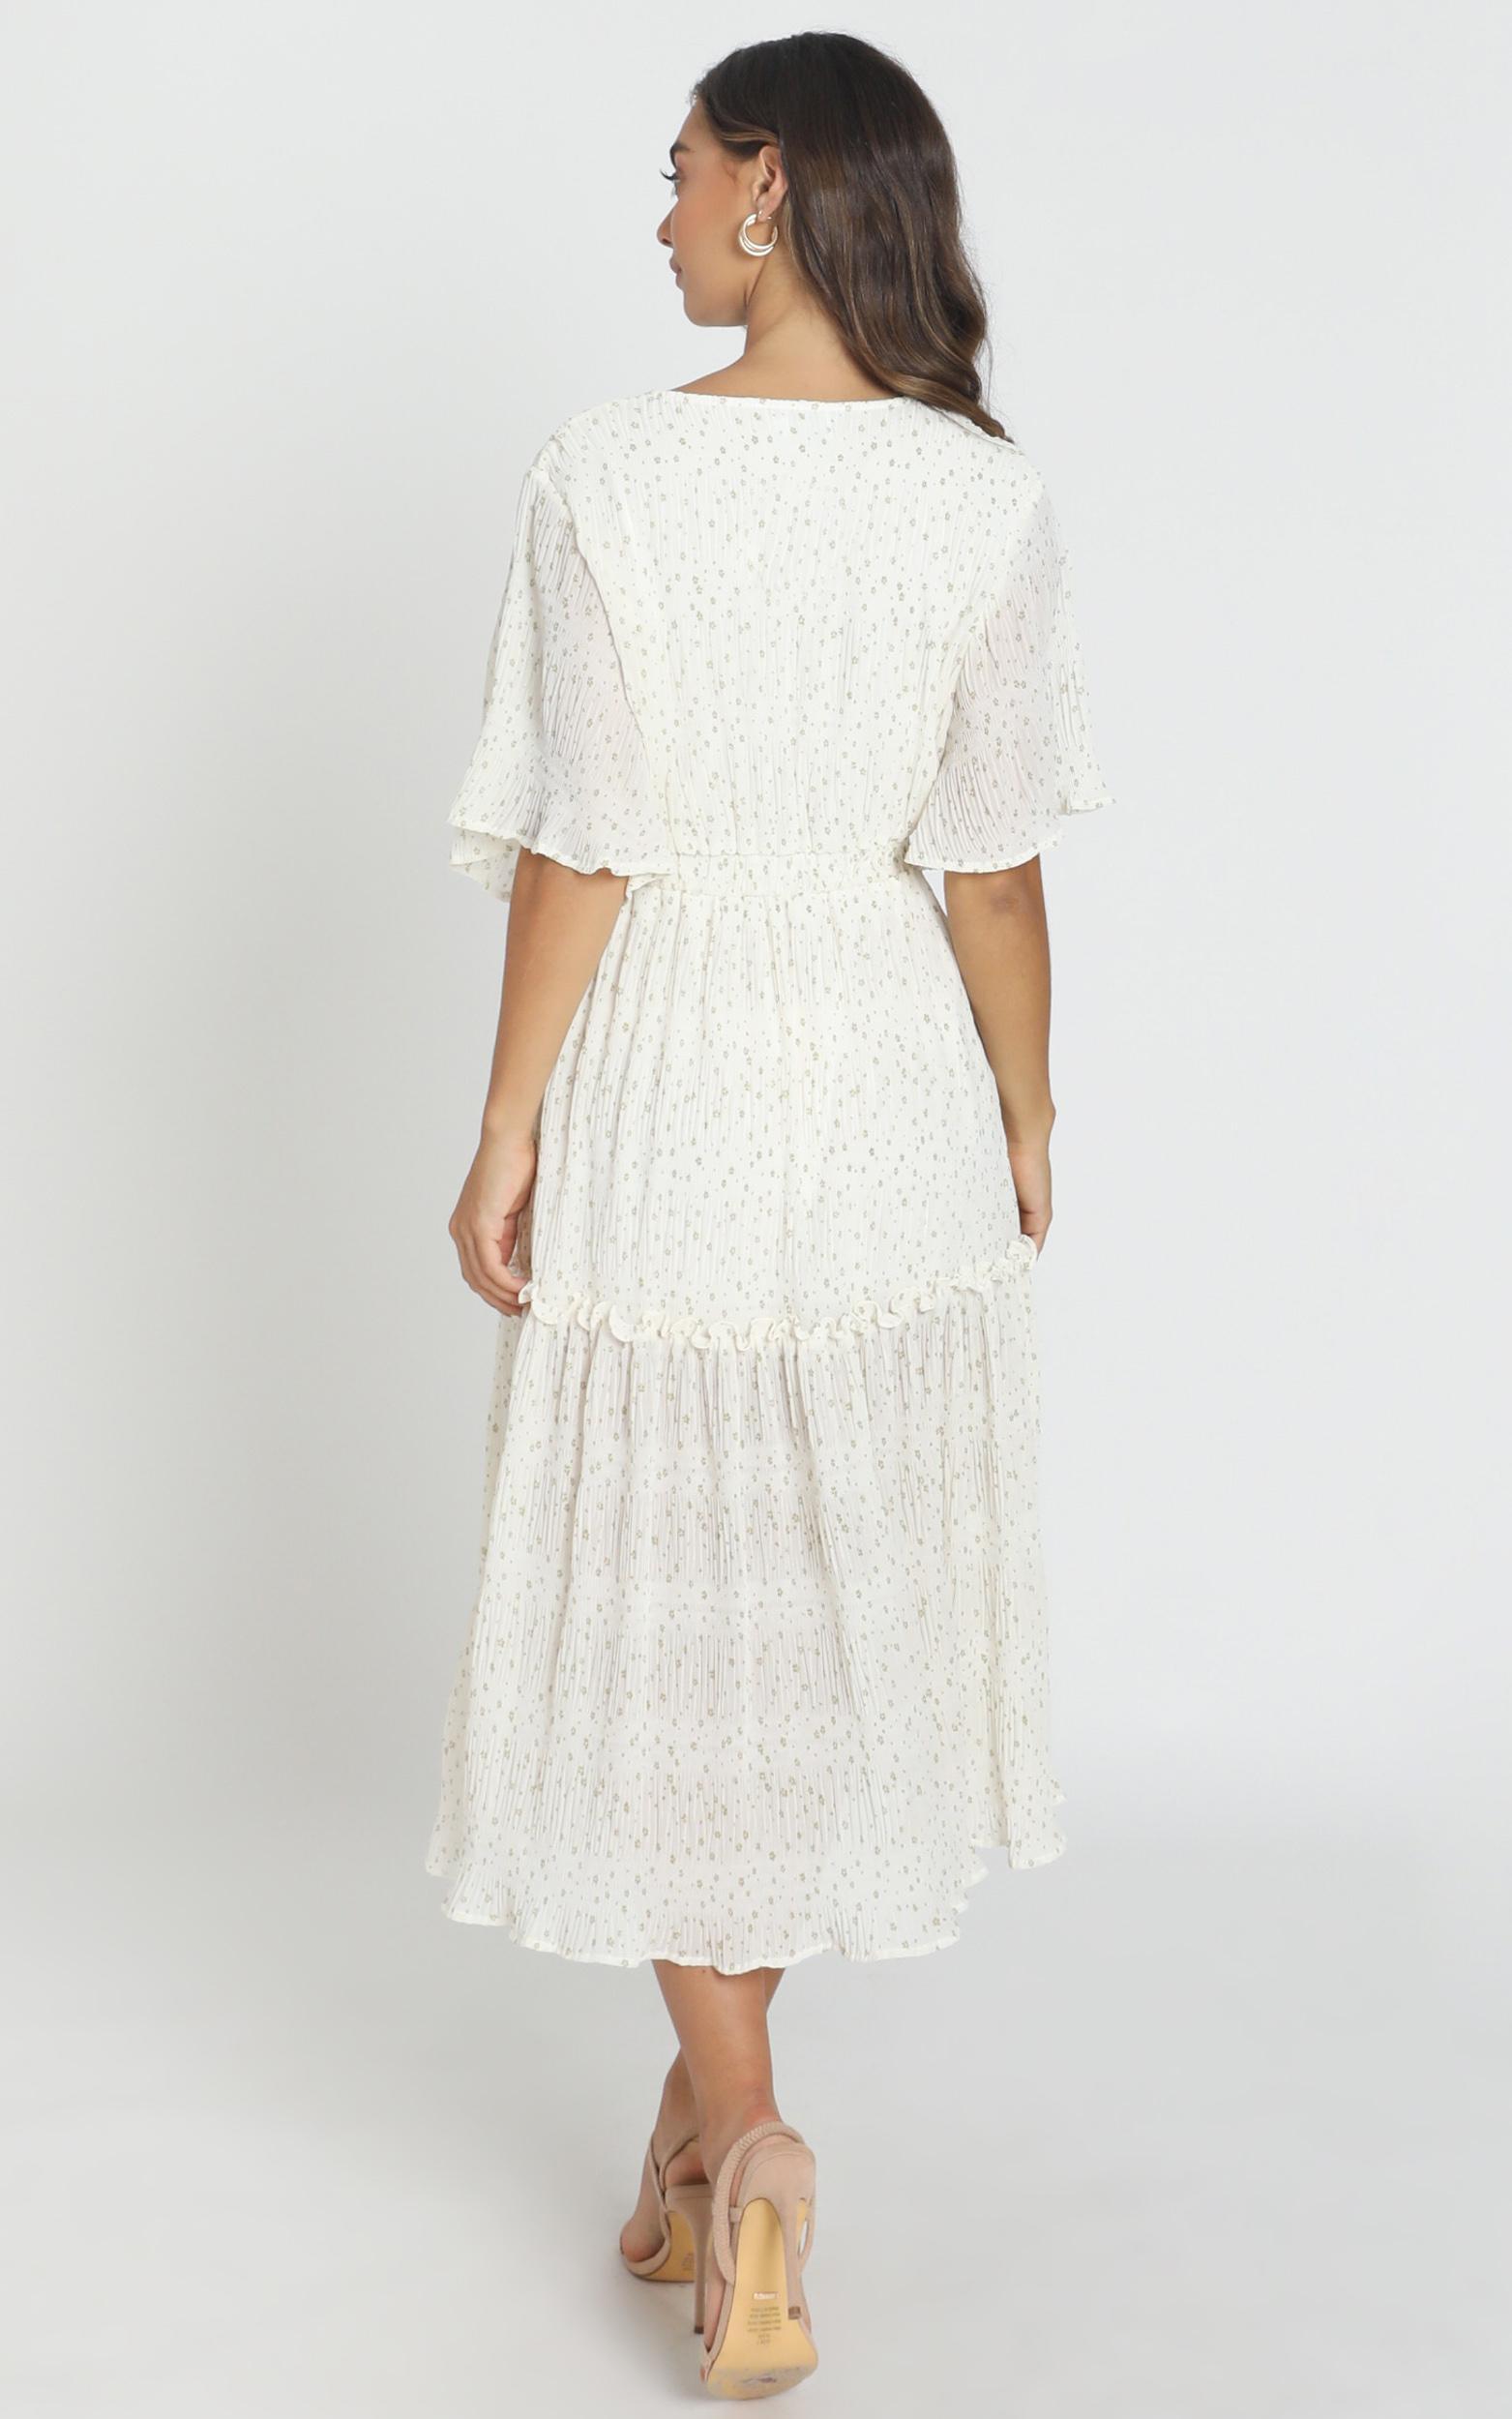 Remi Midi Dress in white - 6 (XS), White, hi-res image number null